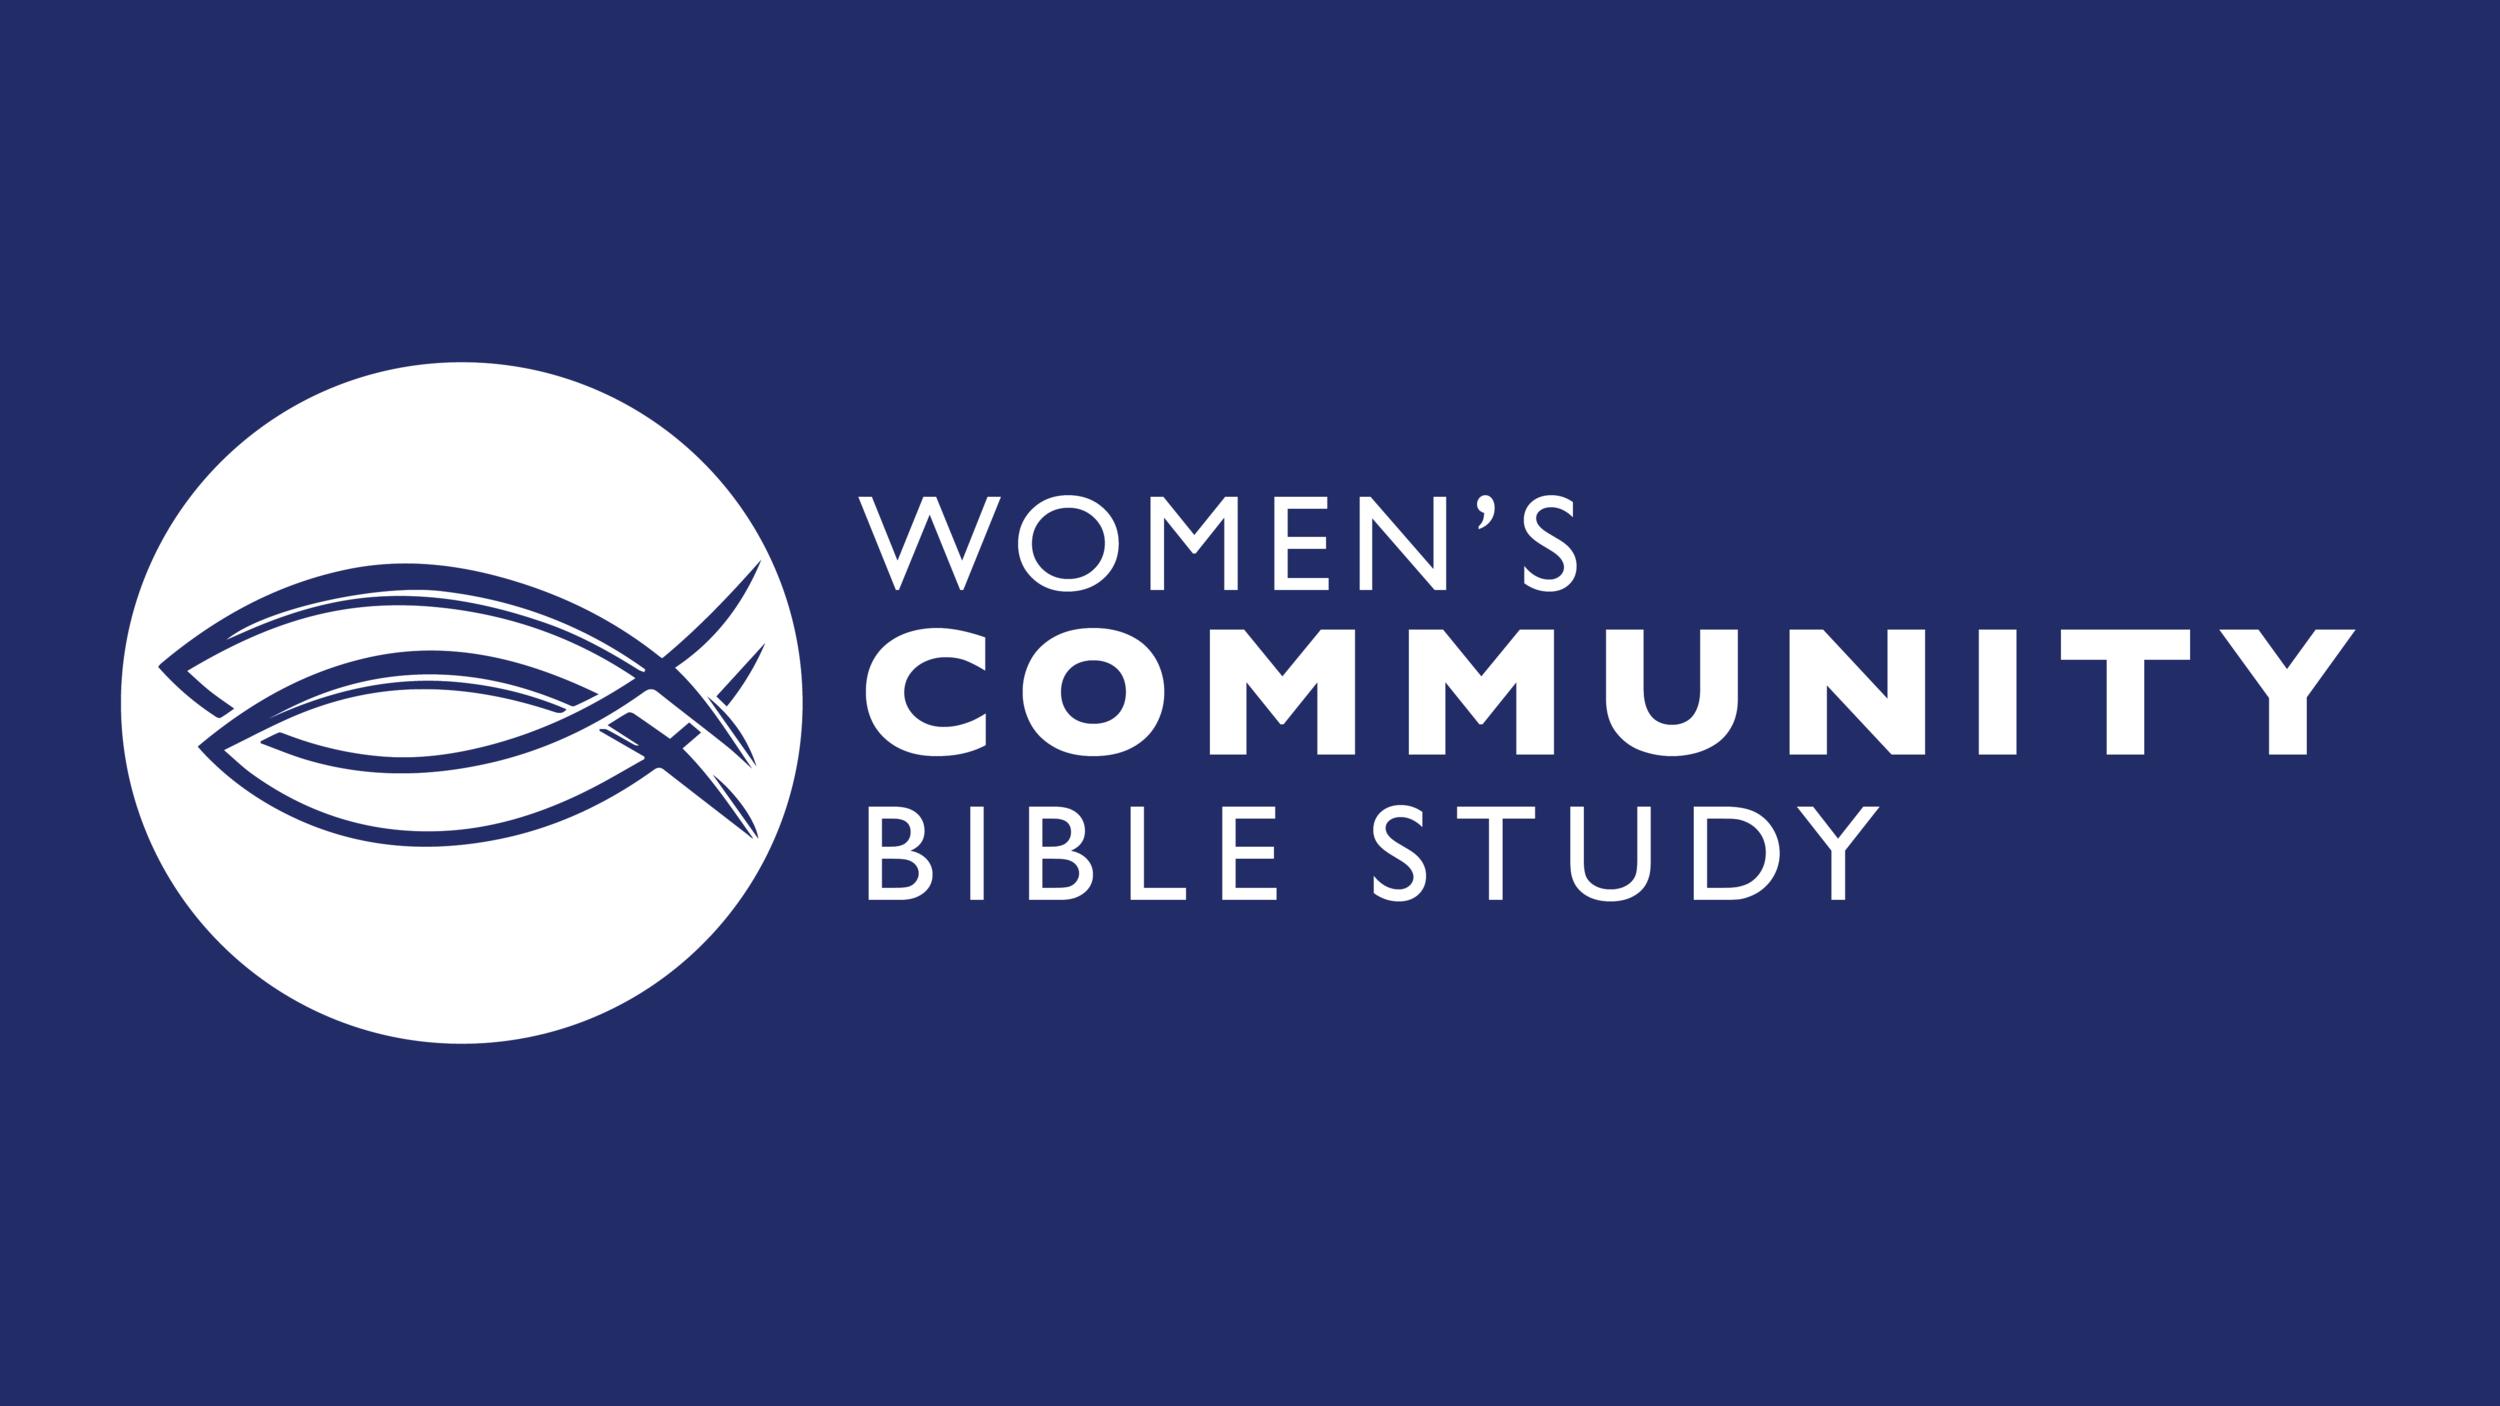 Women's+Community+Bible+Study.png